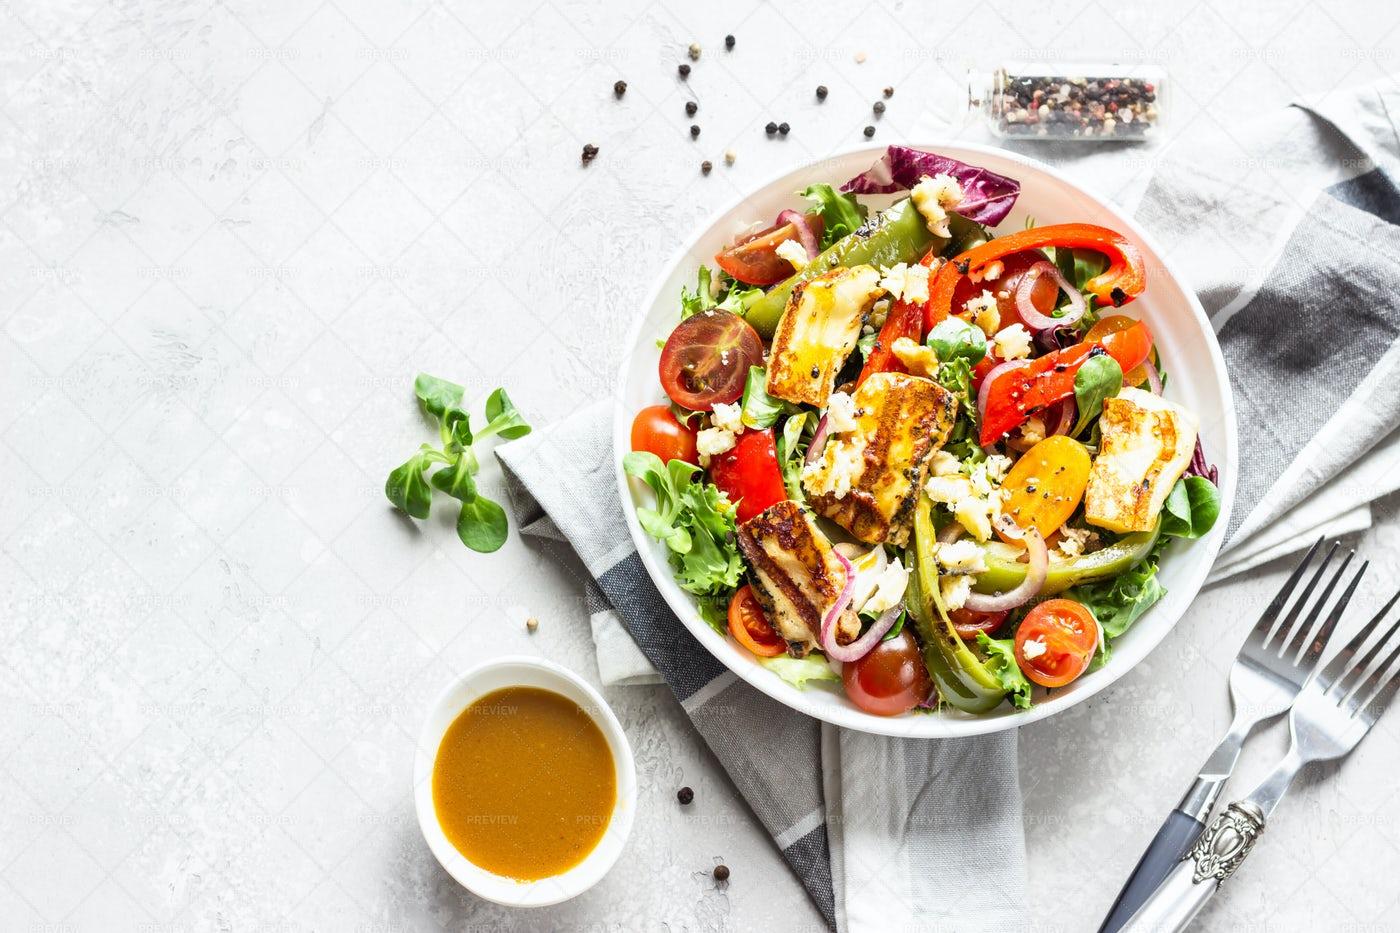 A Salad Dinner: Stock Photos